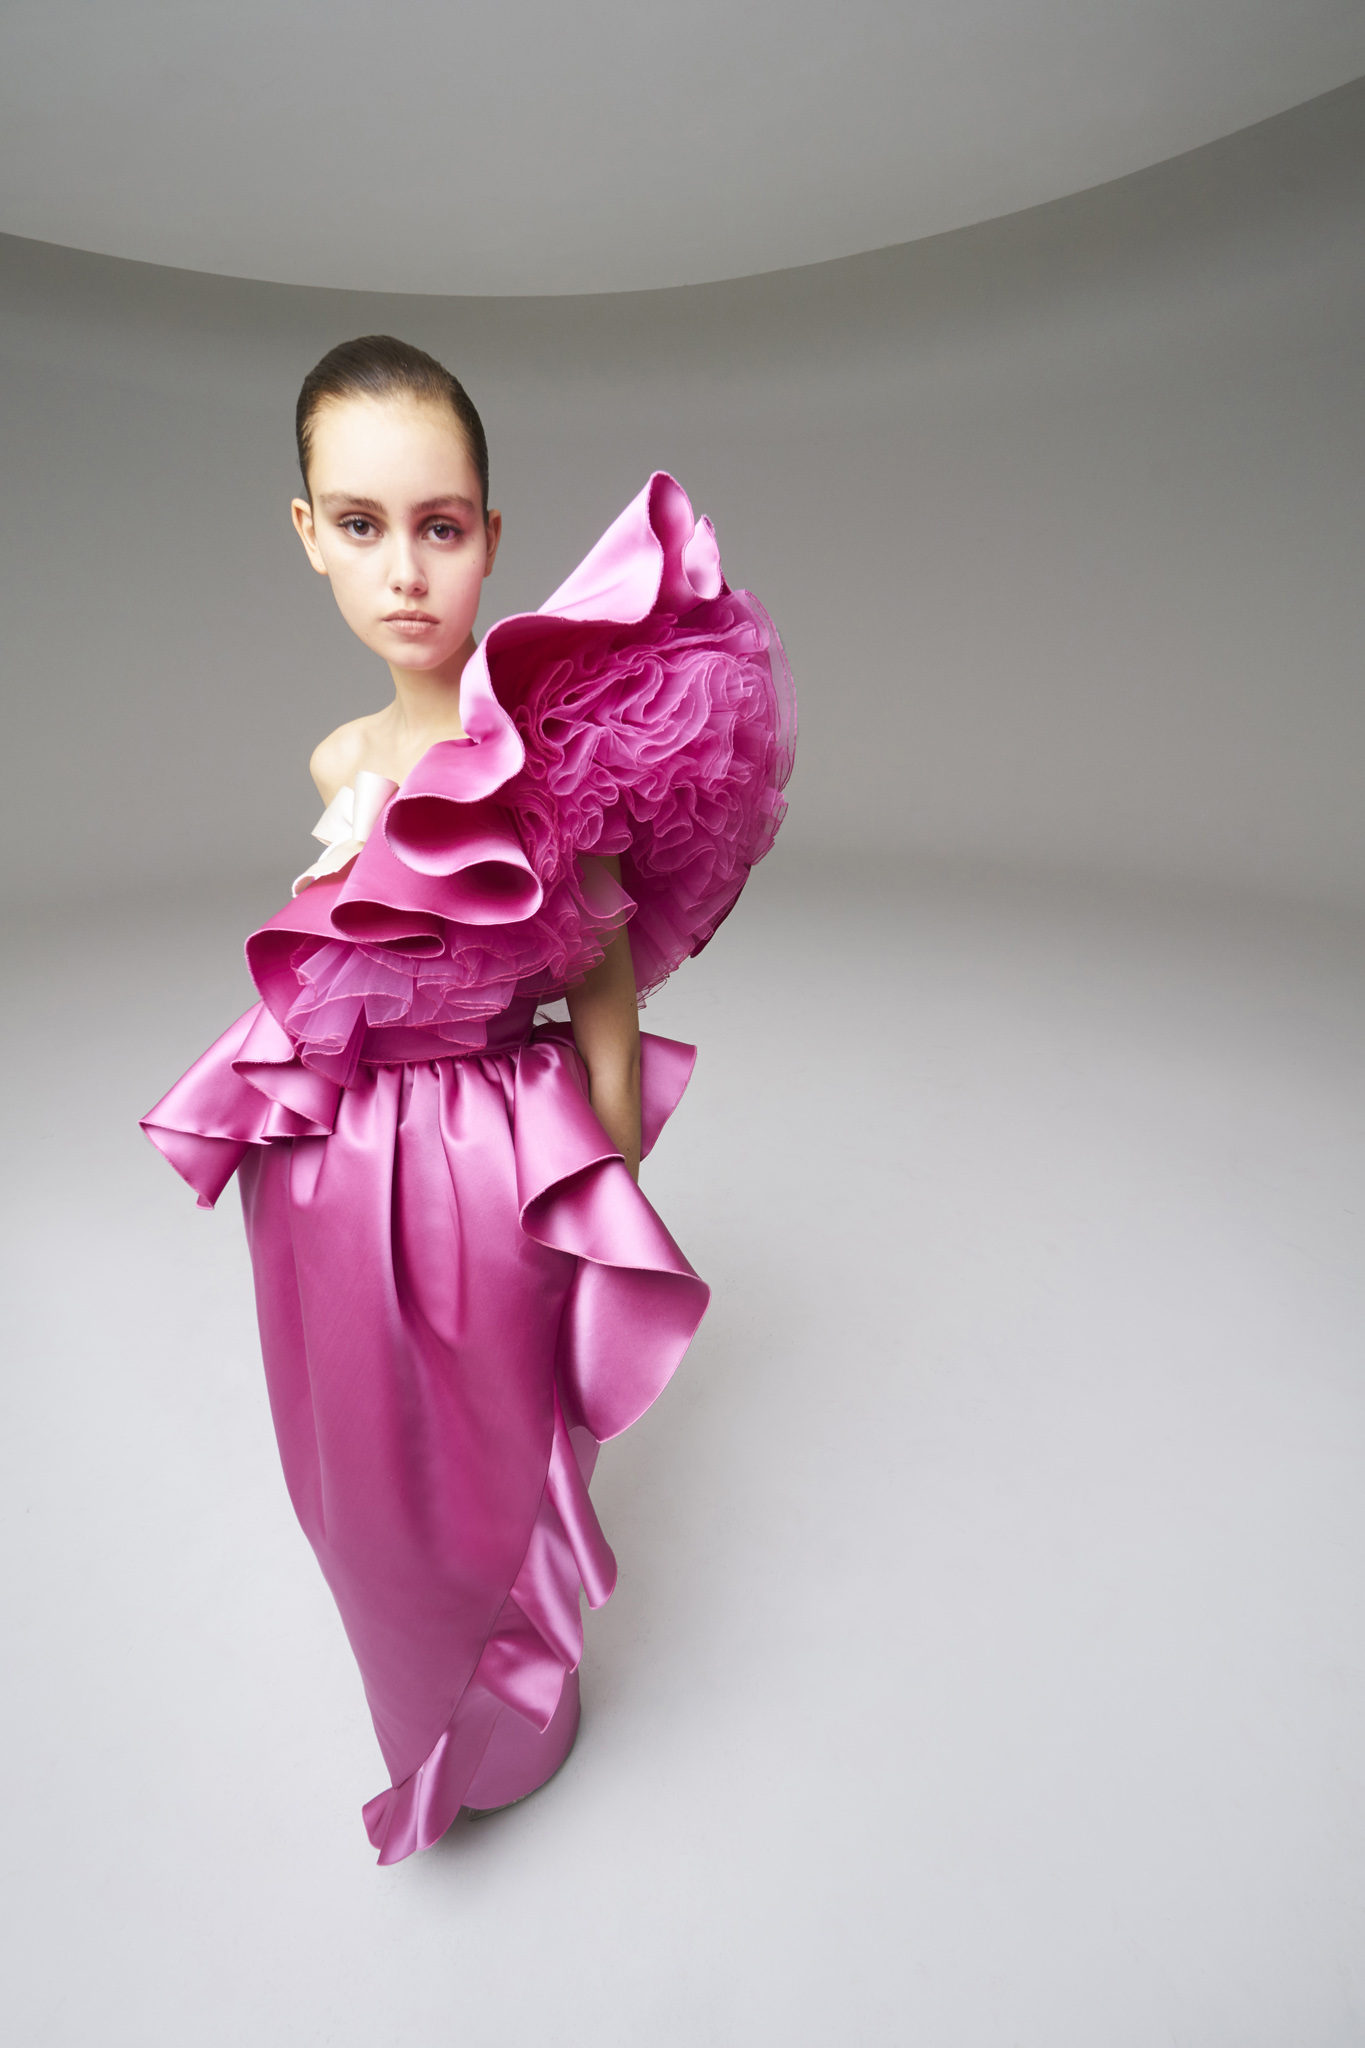 Giambattista Valli Couture Spring Summer 2020